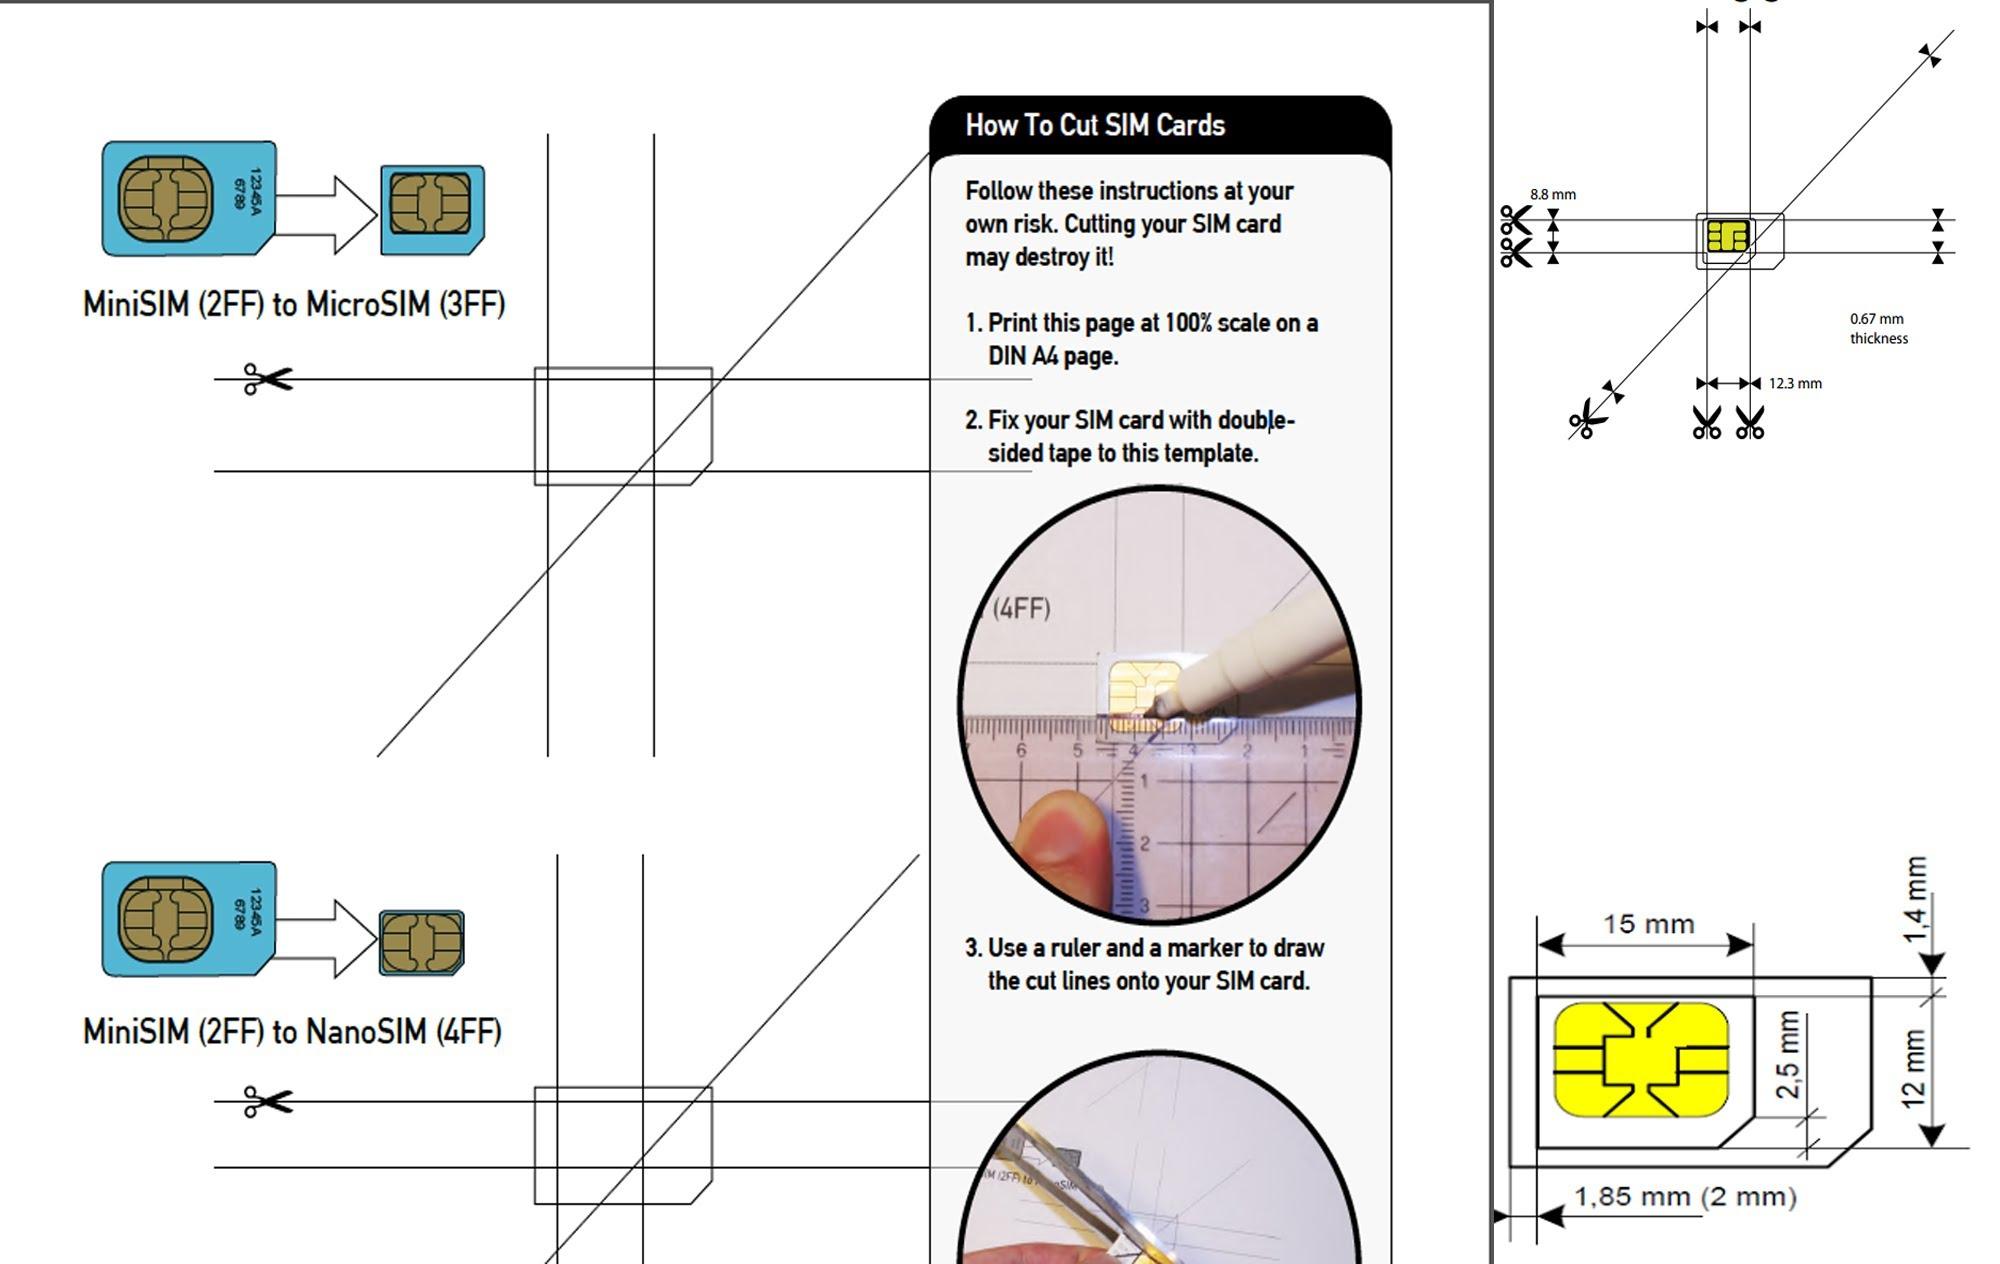 Micro SIM To Nano SIM Template SIM cutting guide